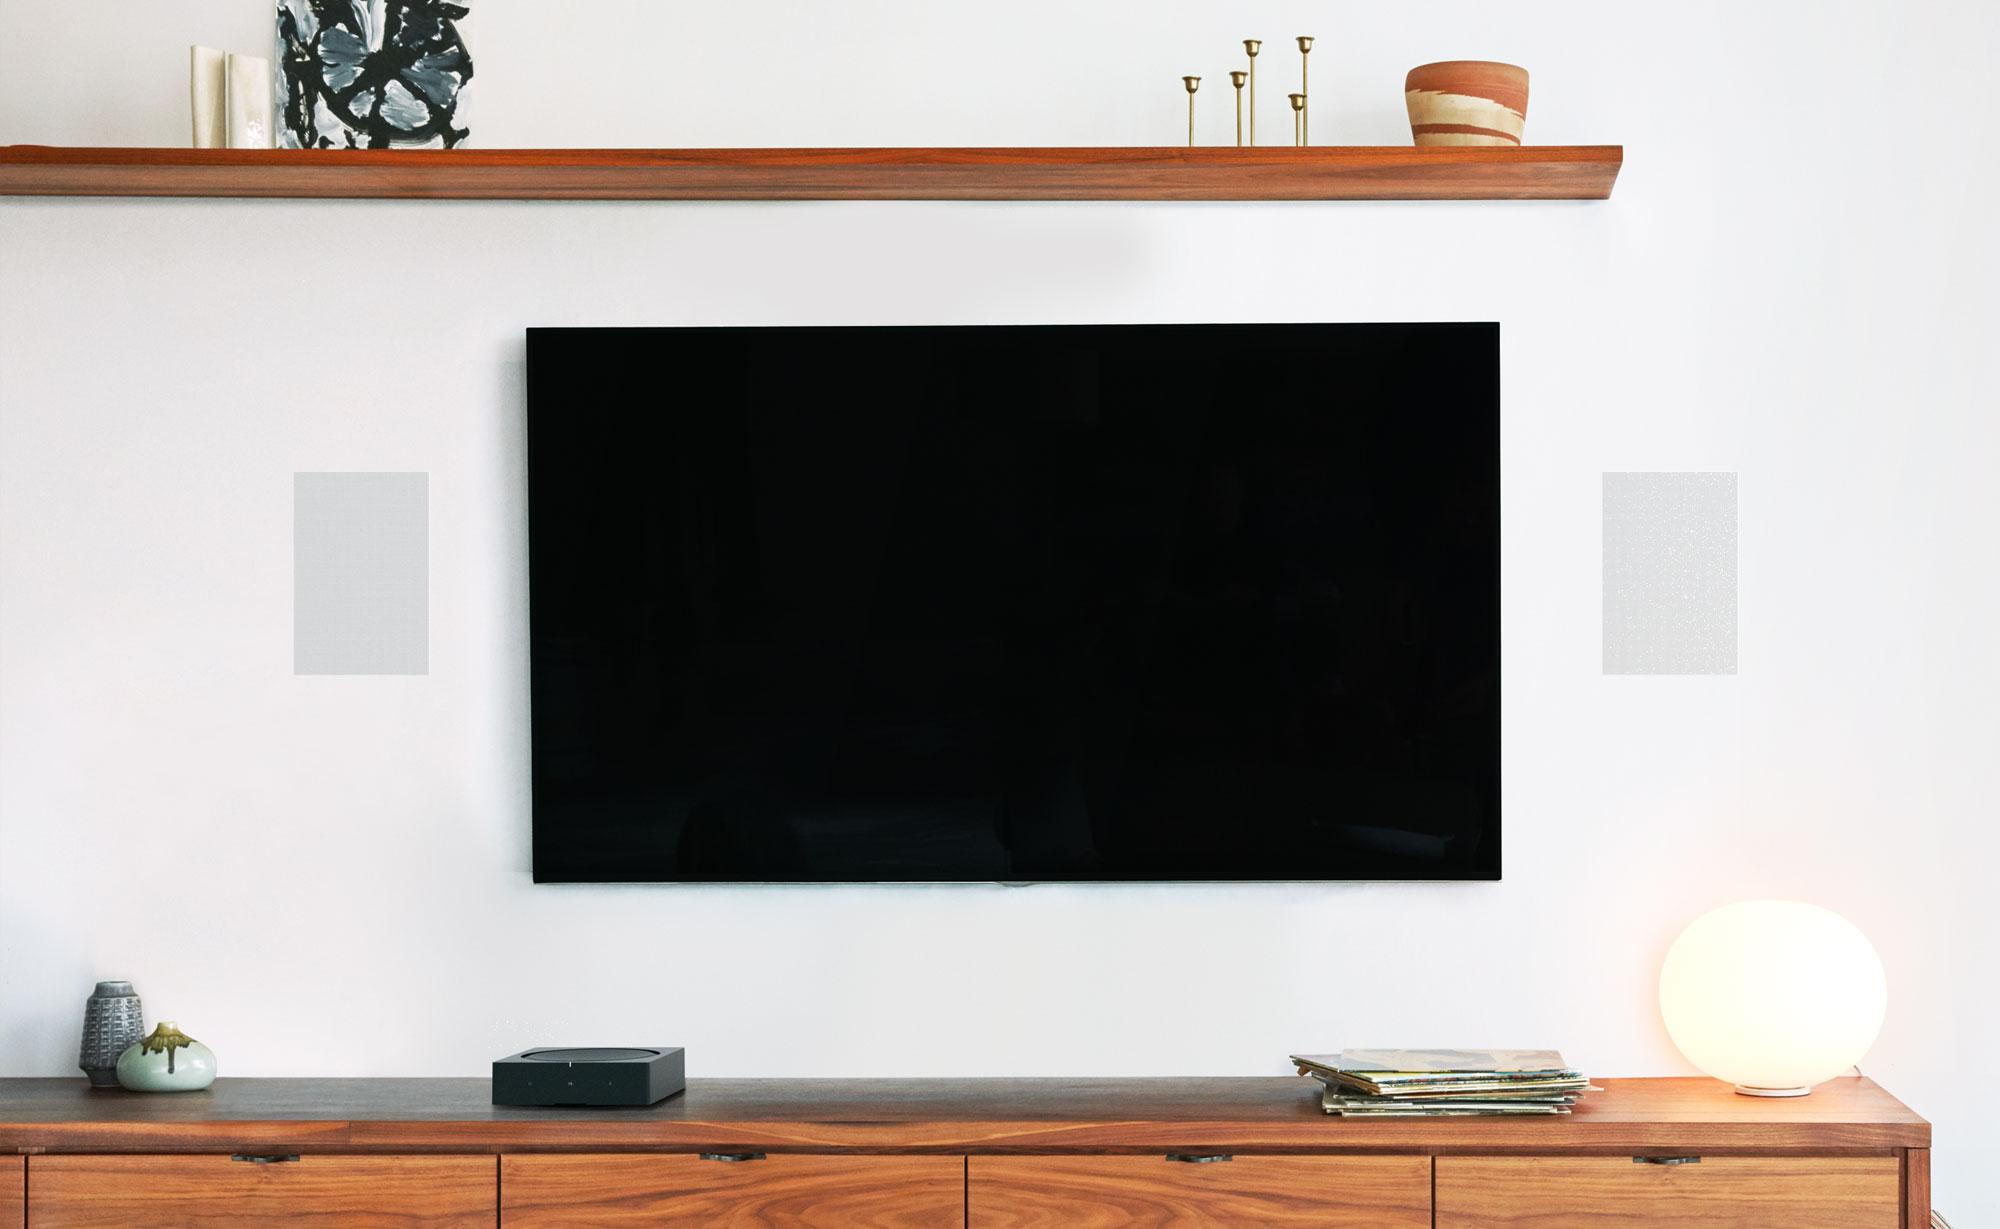 sonos-in-wall-speakers-tv